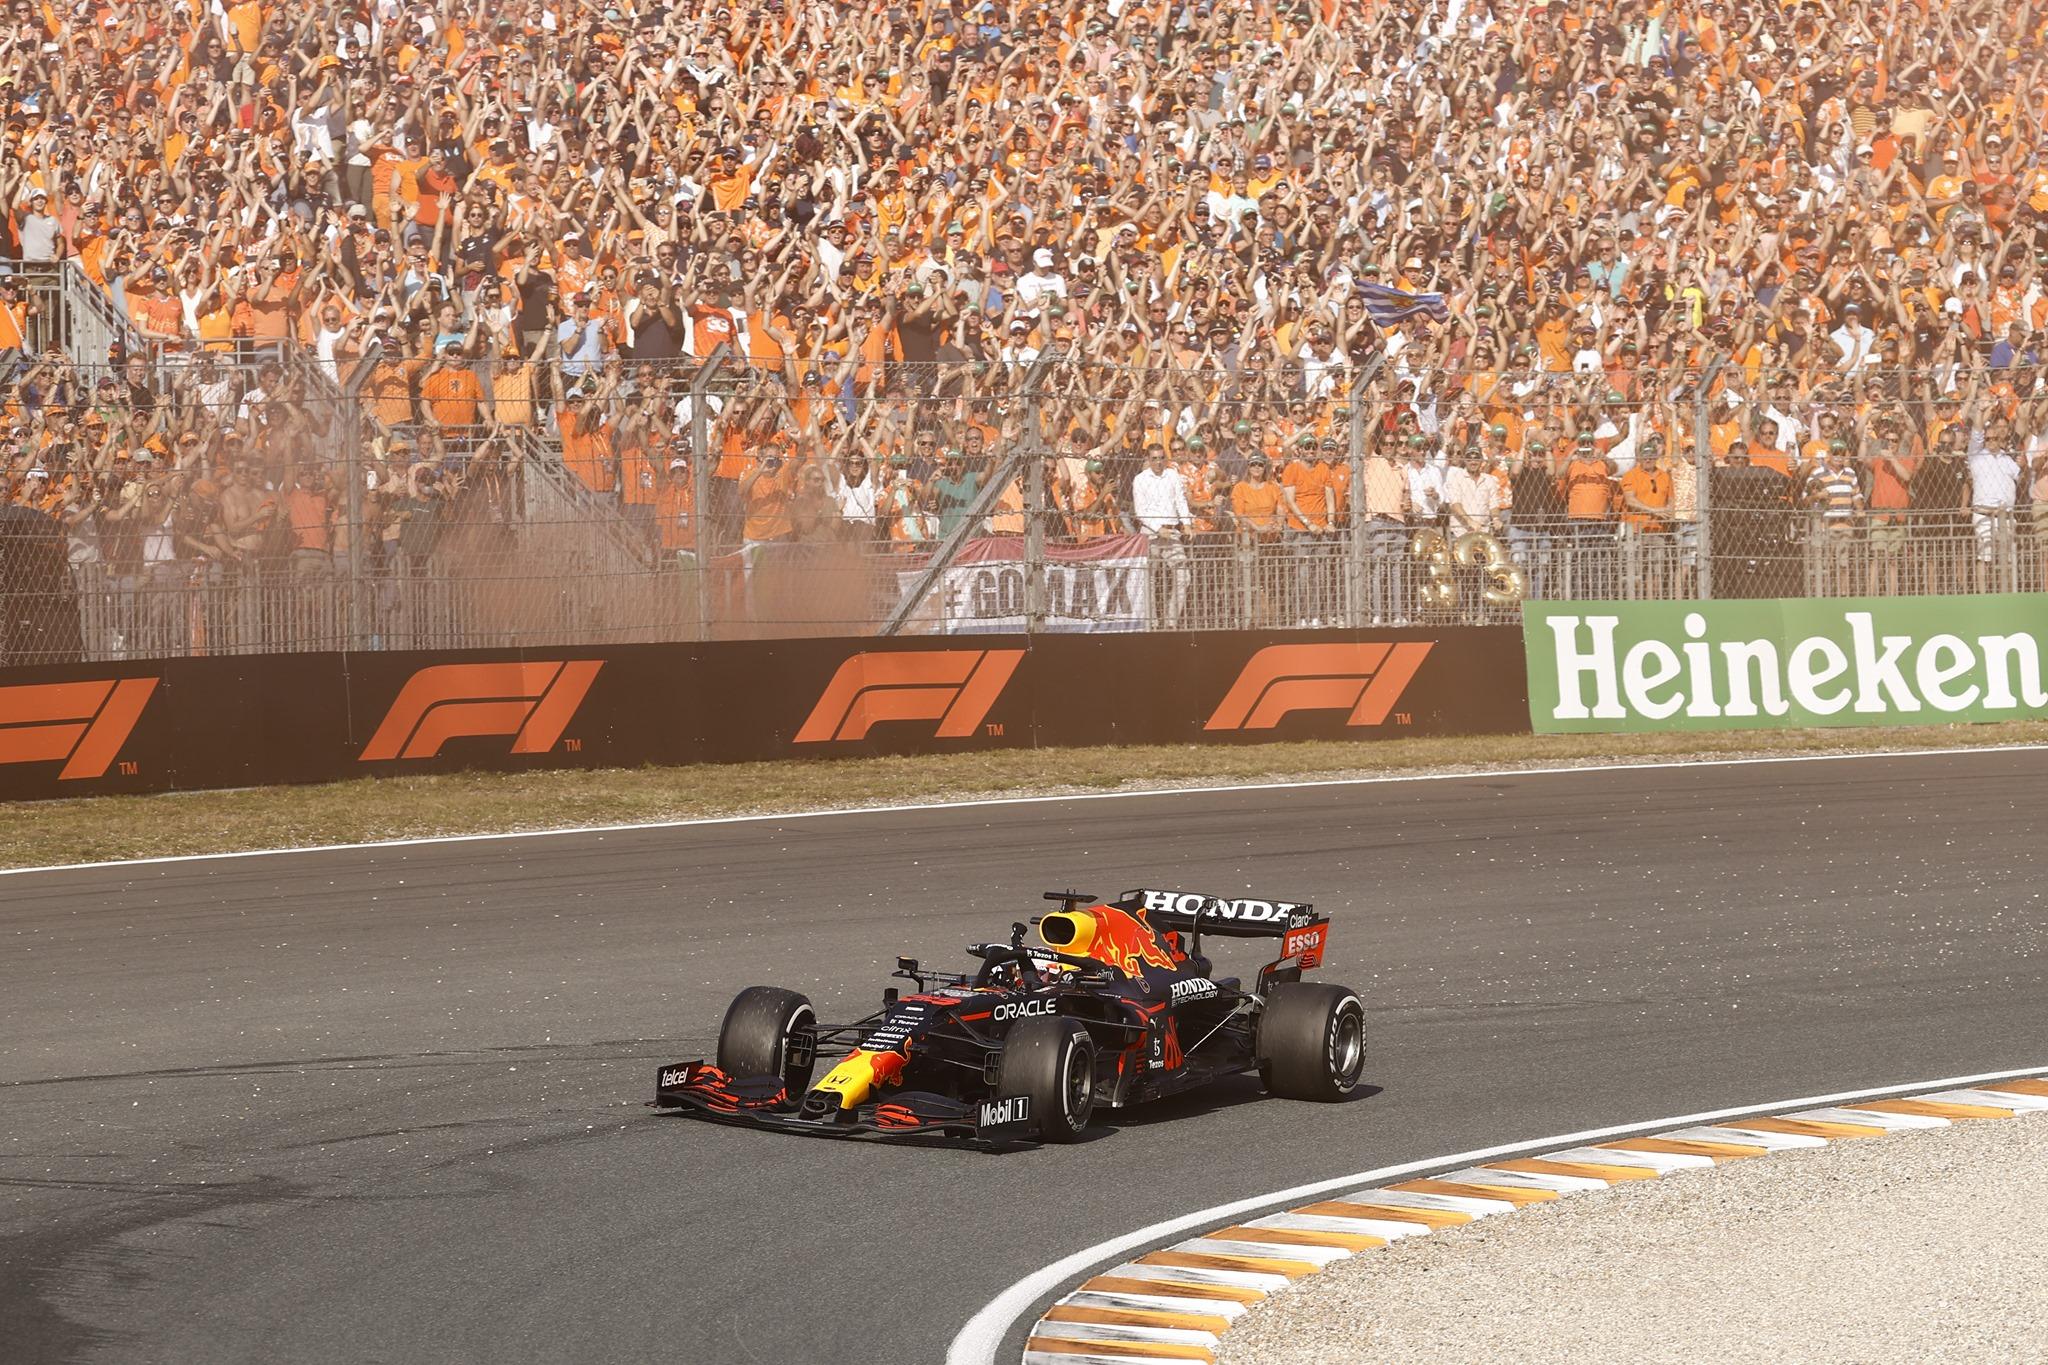 Verstappen thắng chặn Grand Prix Hà Lan 2021